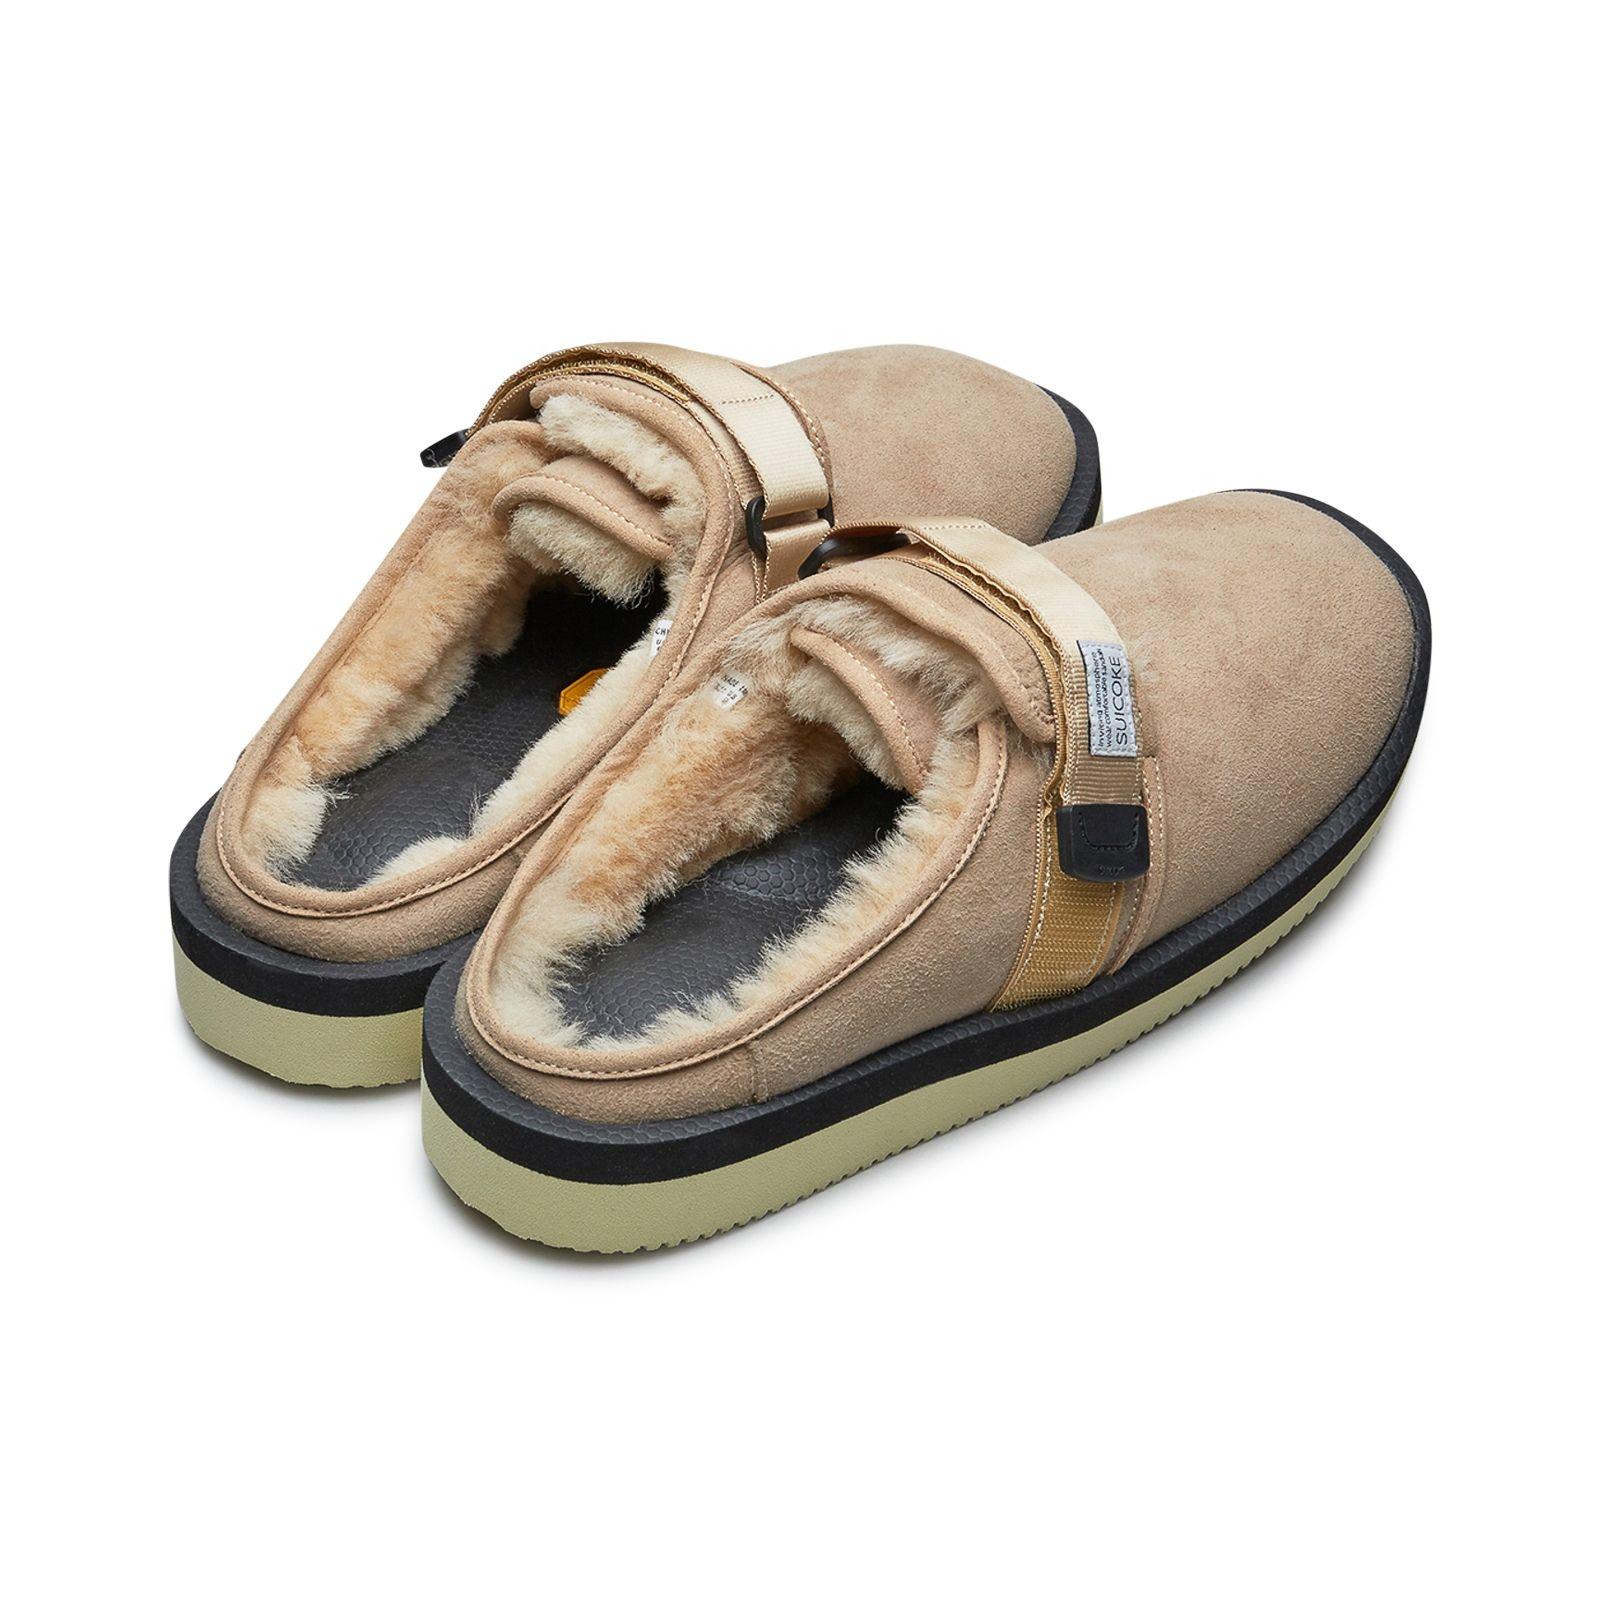 950a1552aac Suicoke Zavo VM2 Sandals